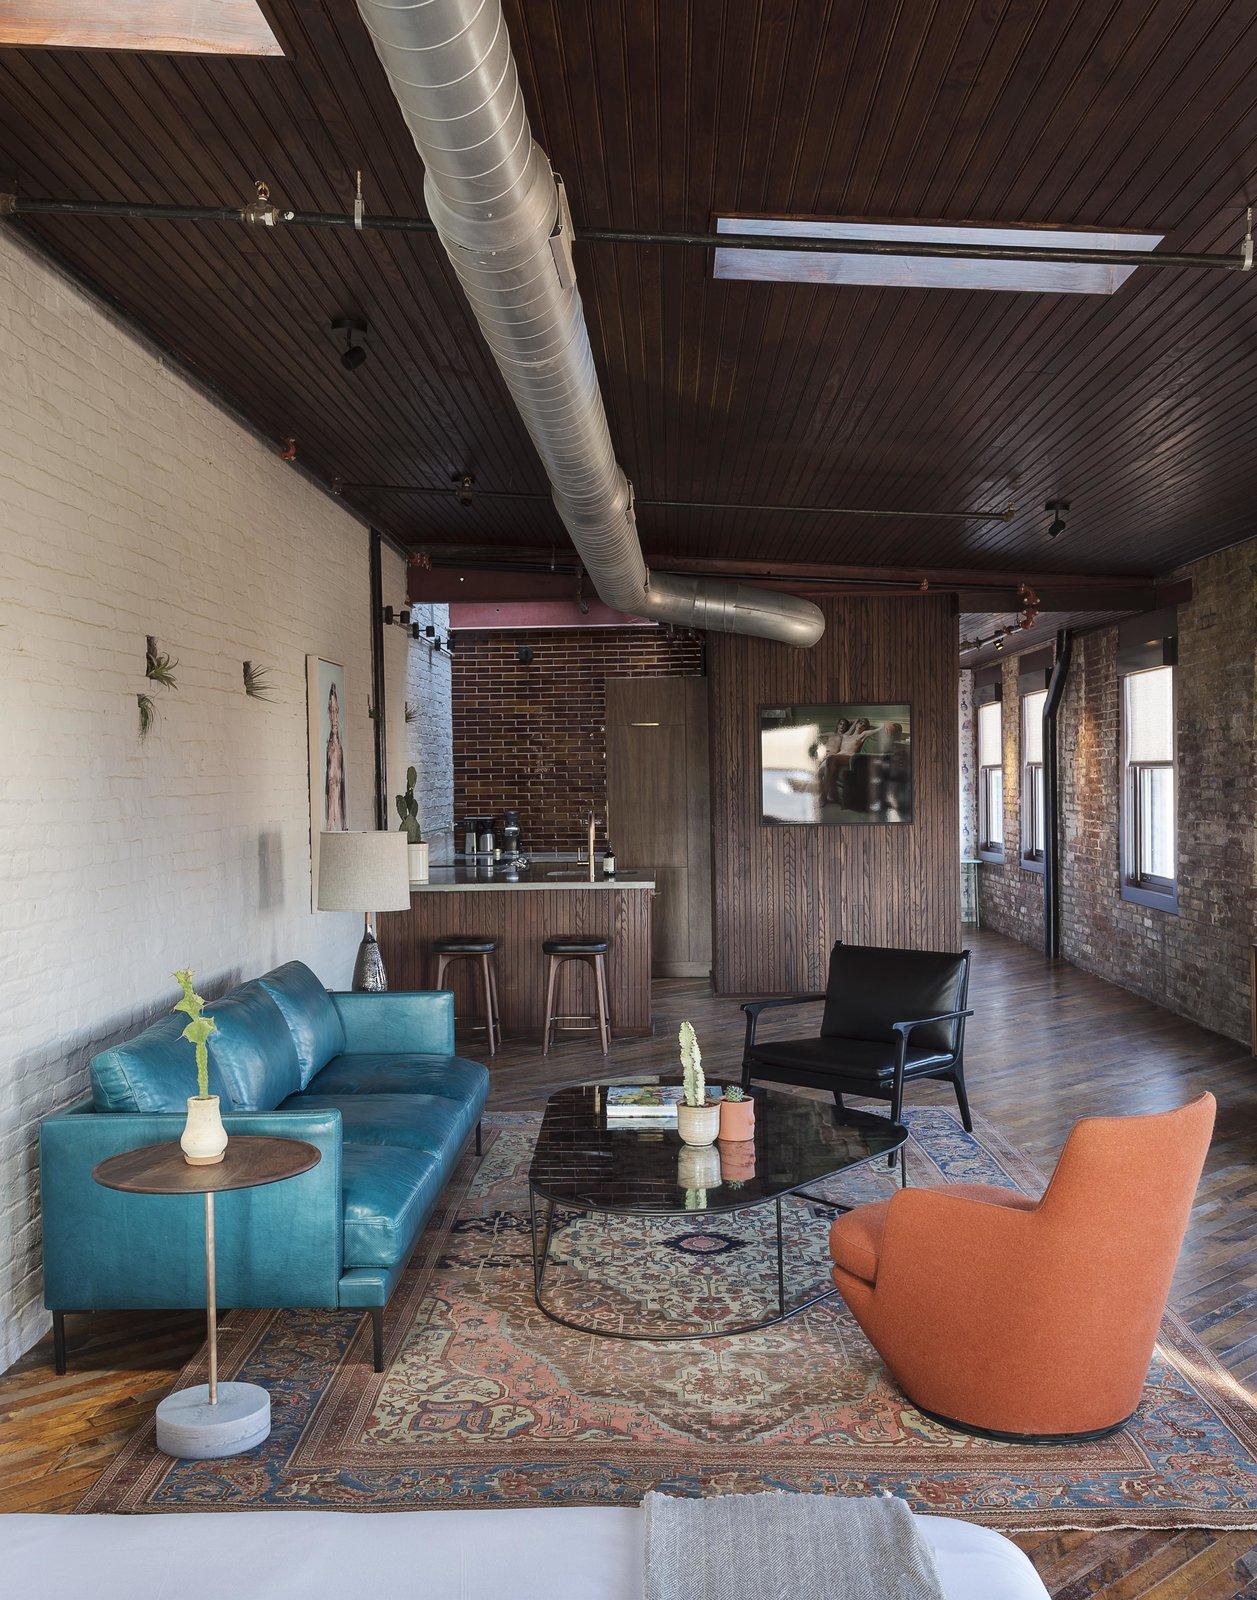 Living Room, Chair, End Tables, Sofa, Lamps, Bar, Stools, and Medium Hardwood Floor  Mulherin's Hotel